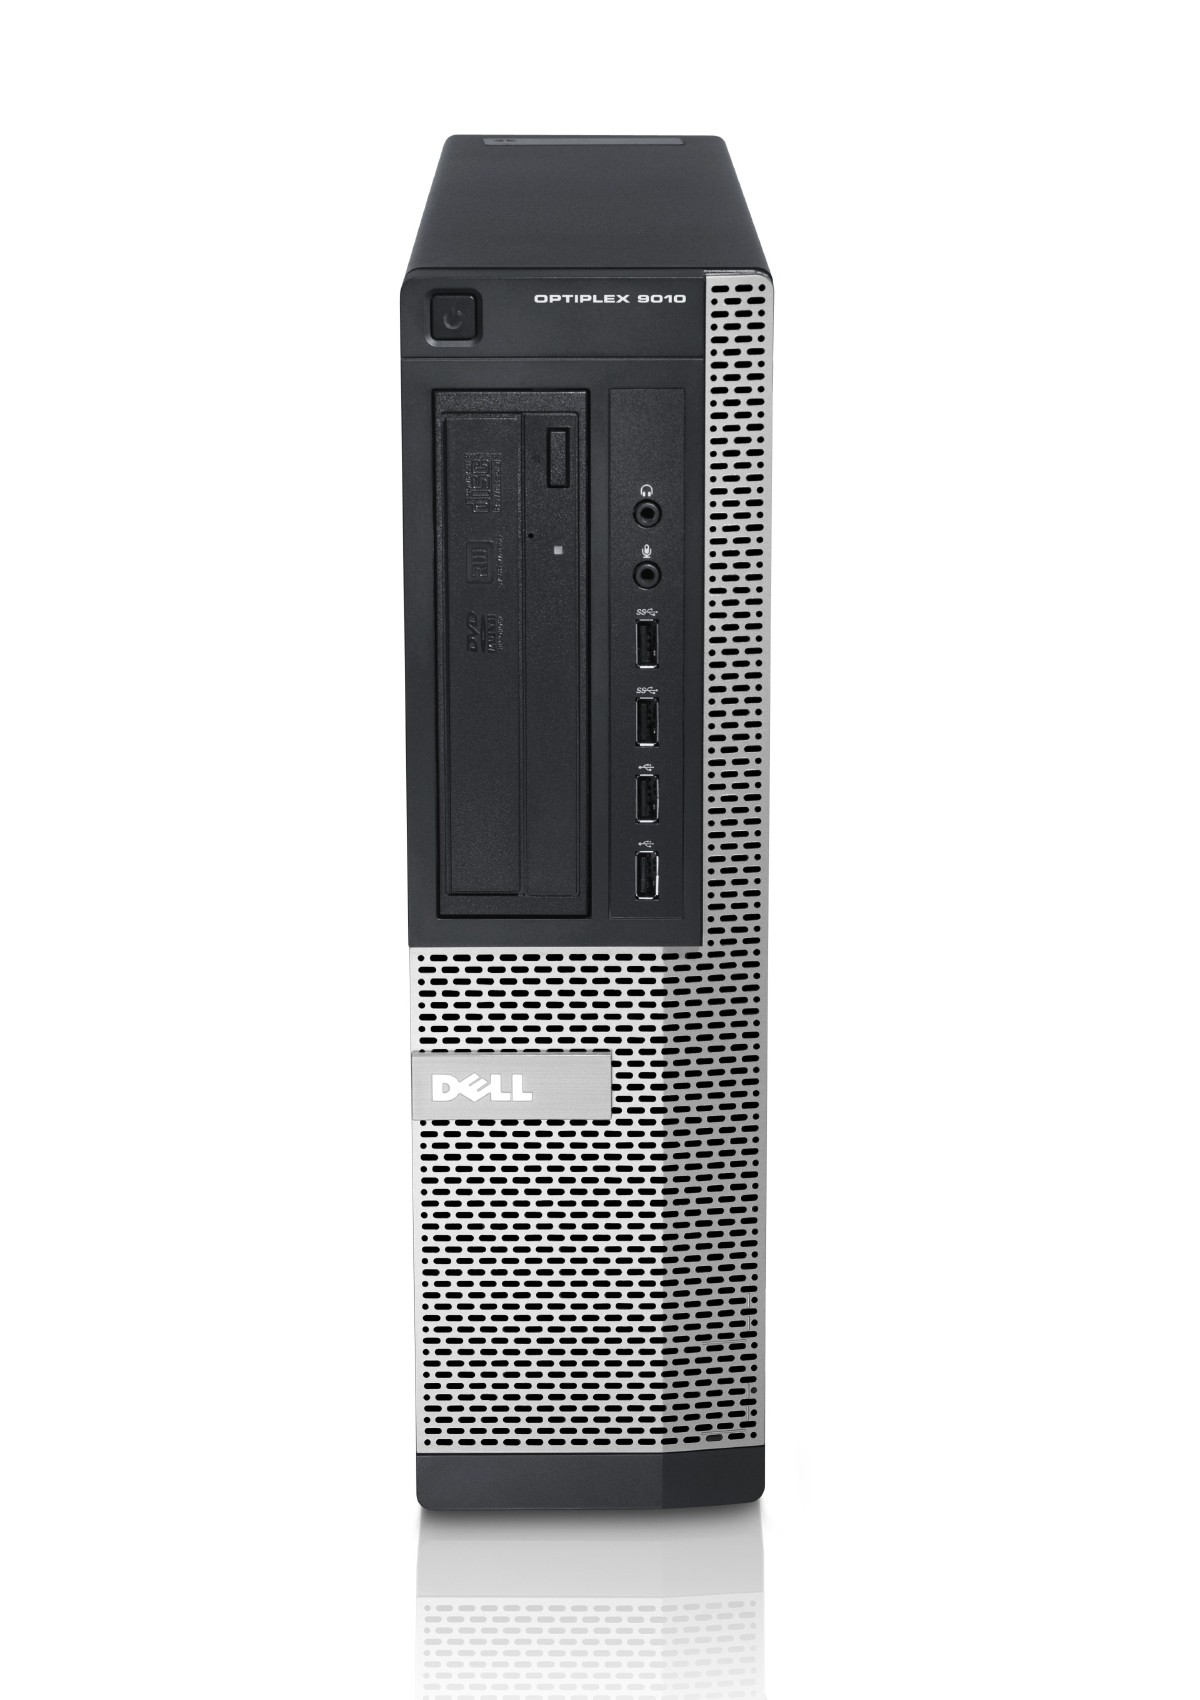 DELOPT9010DTi781T-Dell Optiplex 9010 Desktop Intel Core i7 8GB RAM 1TB HDD DVD+RW with Windows 10 Pro Activated-image